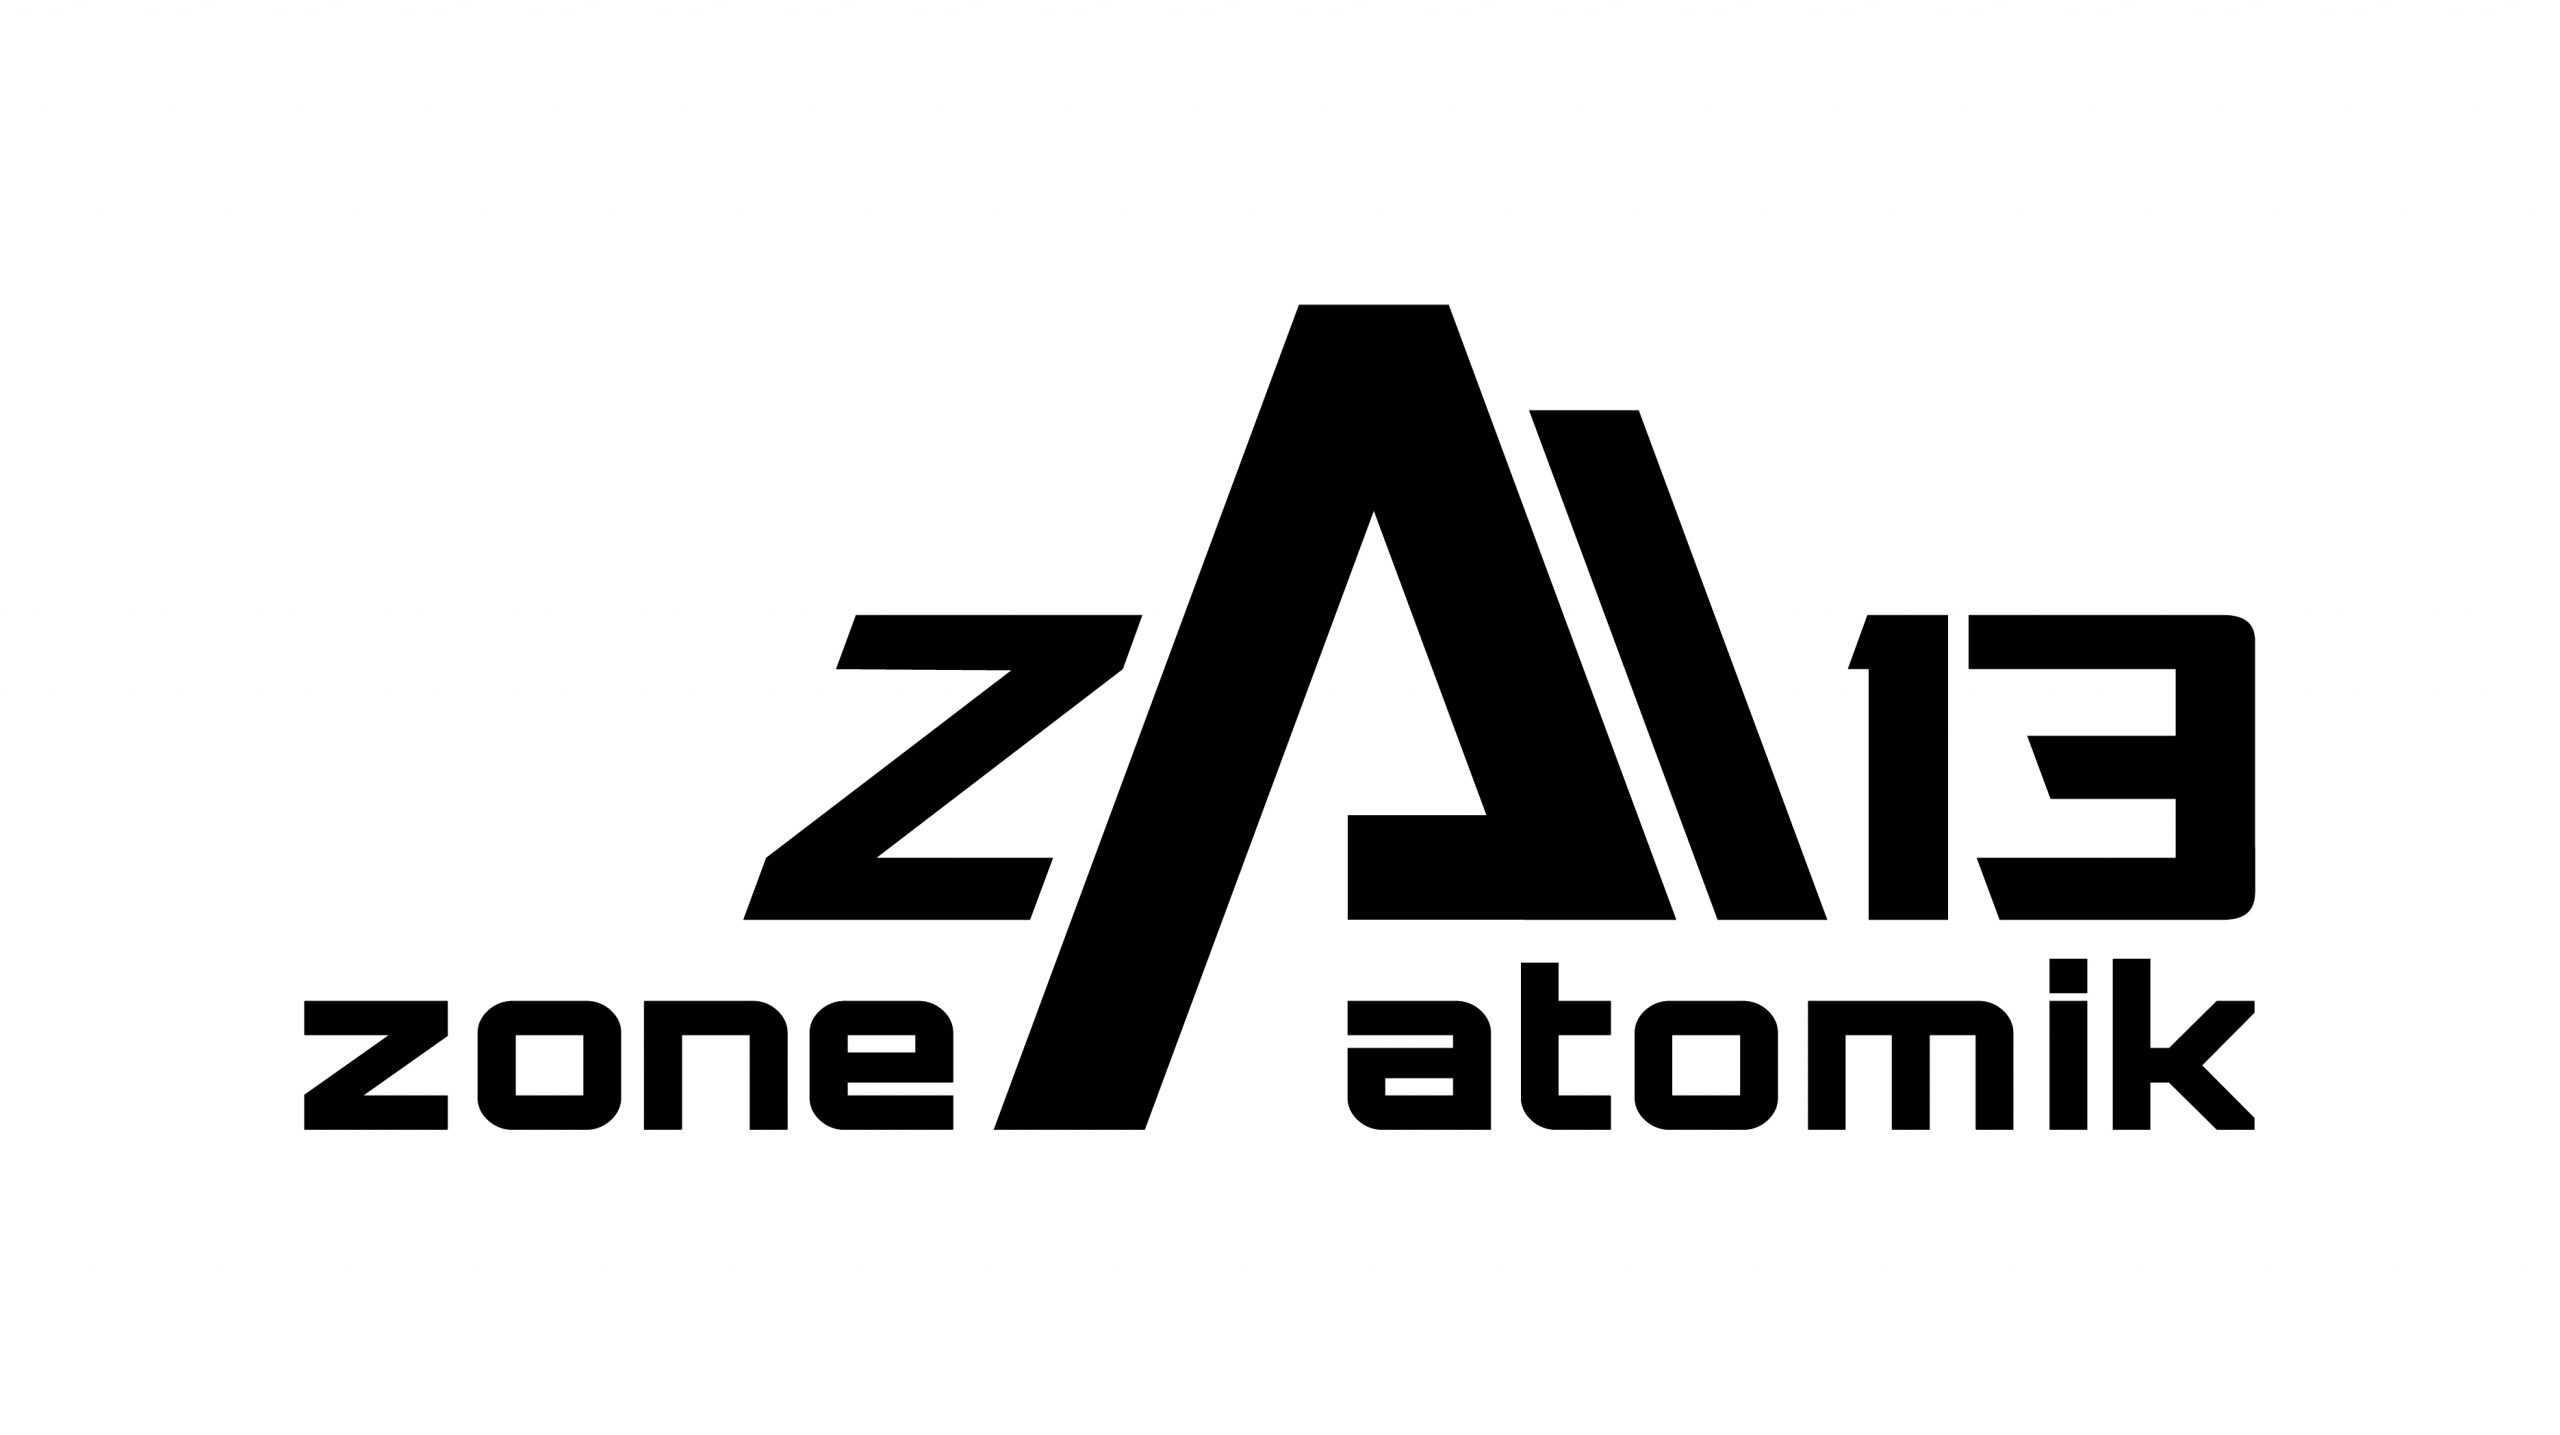 Zone atomik 13